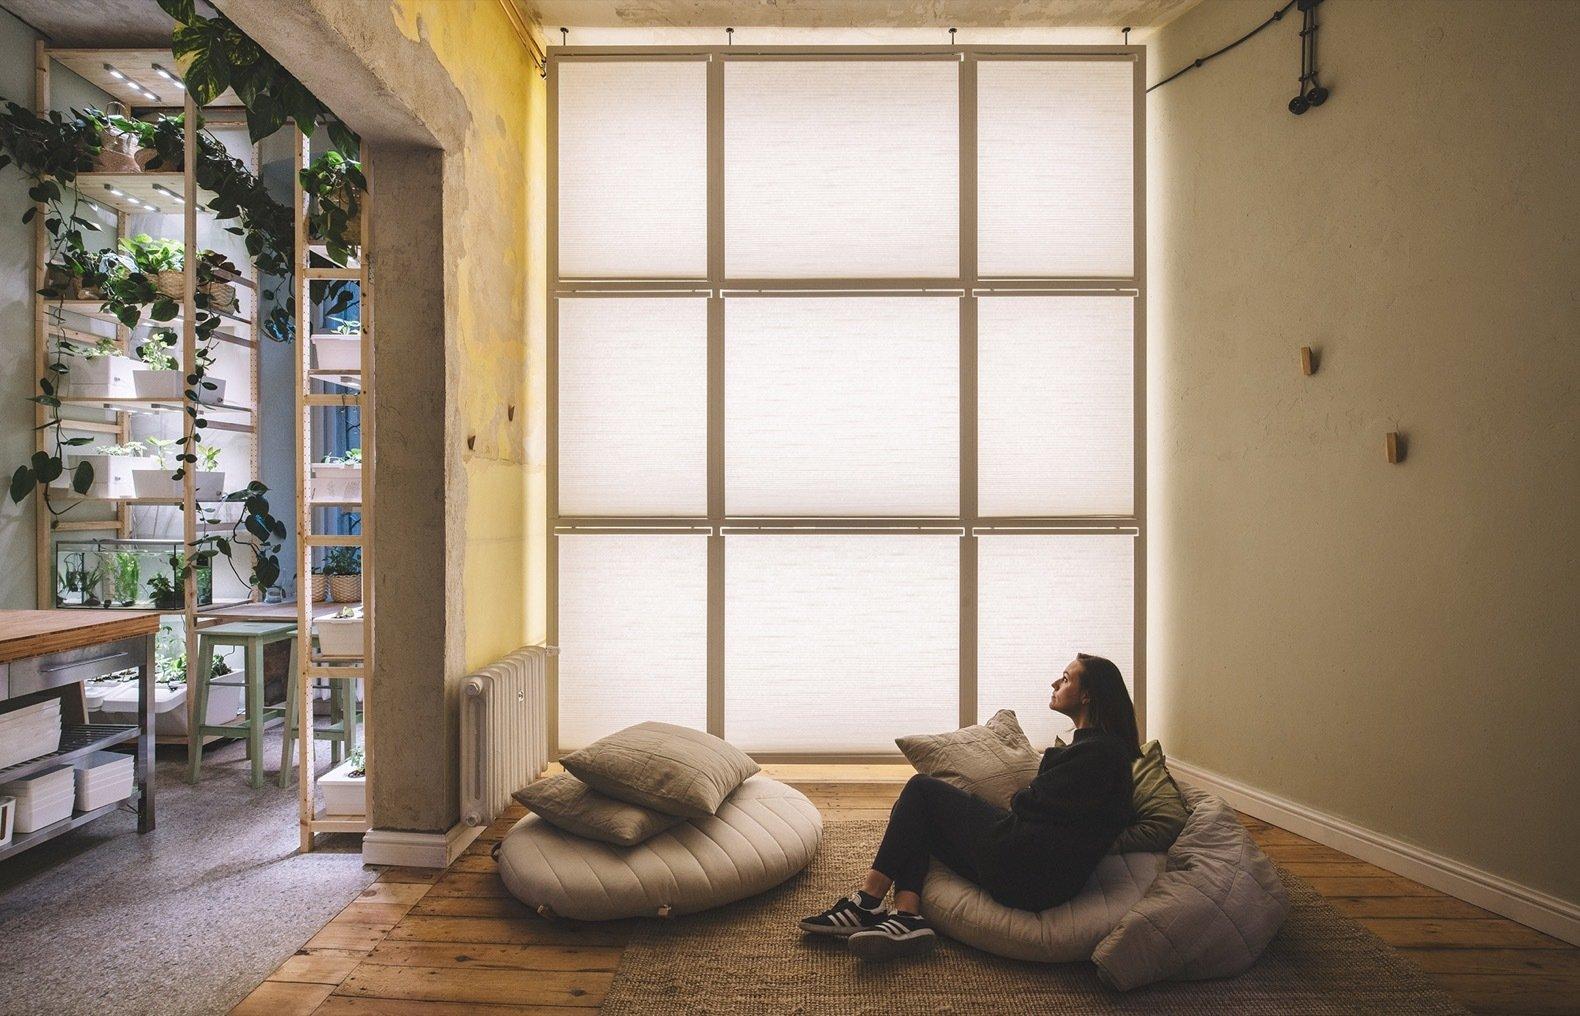 IKEA Home of Tomorrow light installation